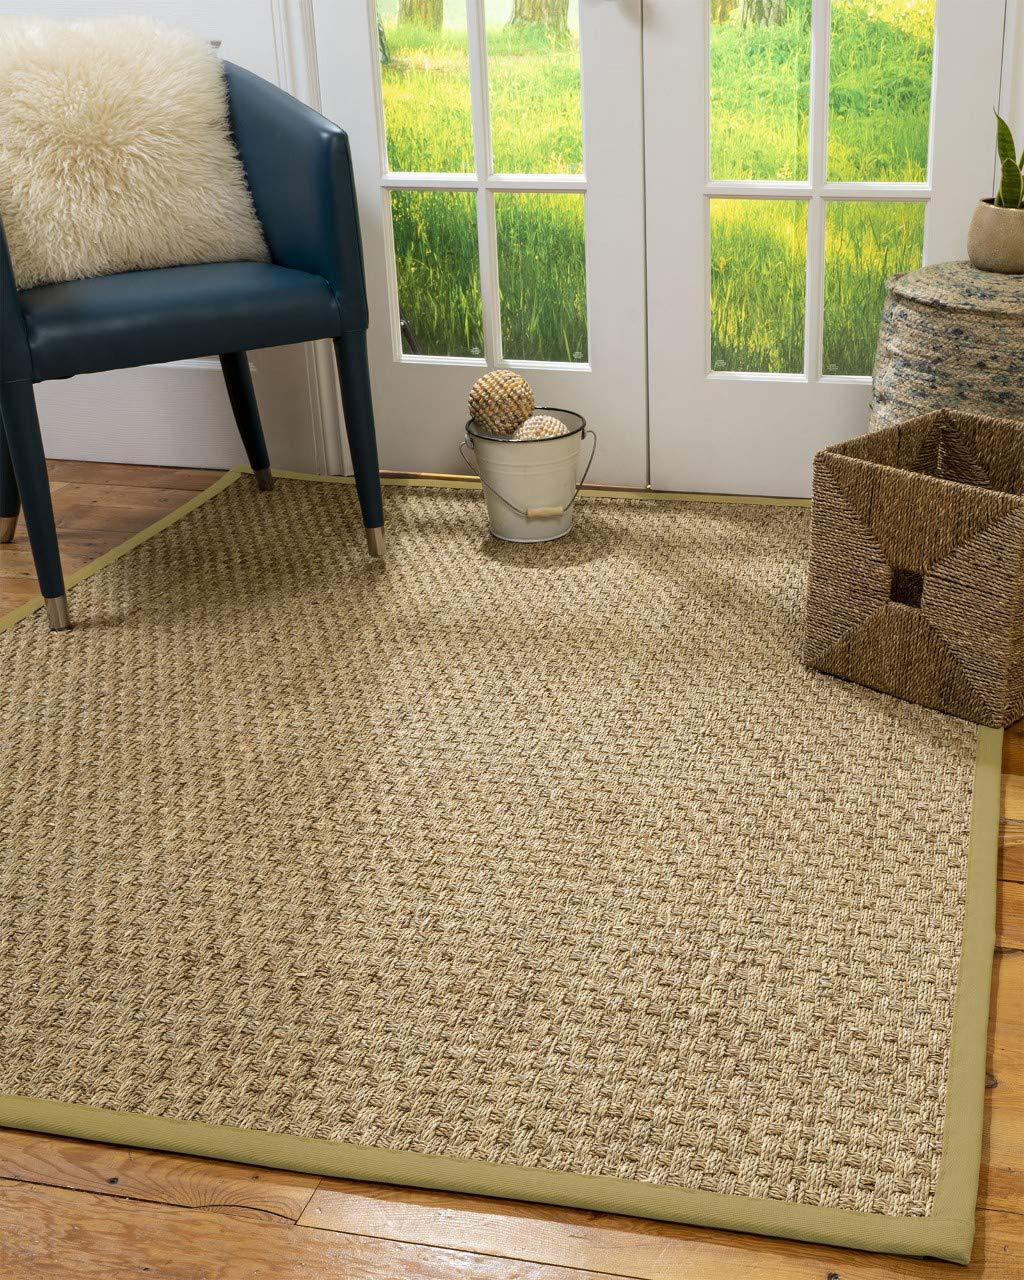 Natural Area Rugs 100 Natural Fiber Handmade Optimum, Natural Seagrass Rug, 4 x 6 Sage Border